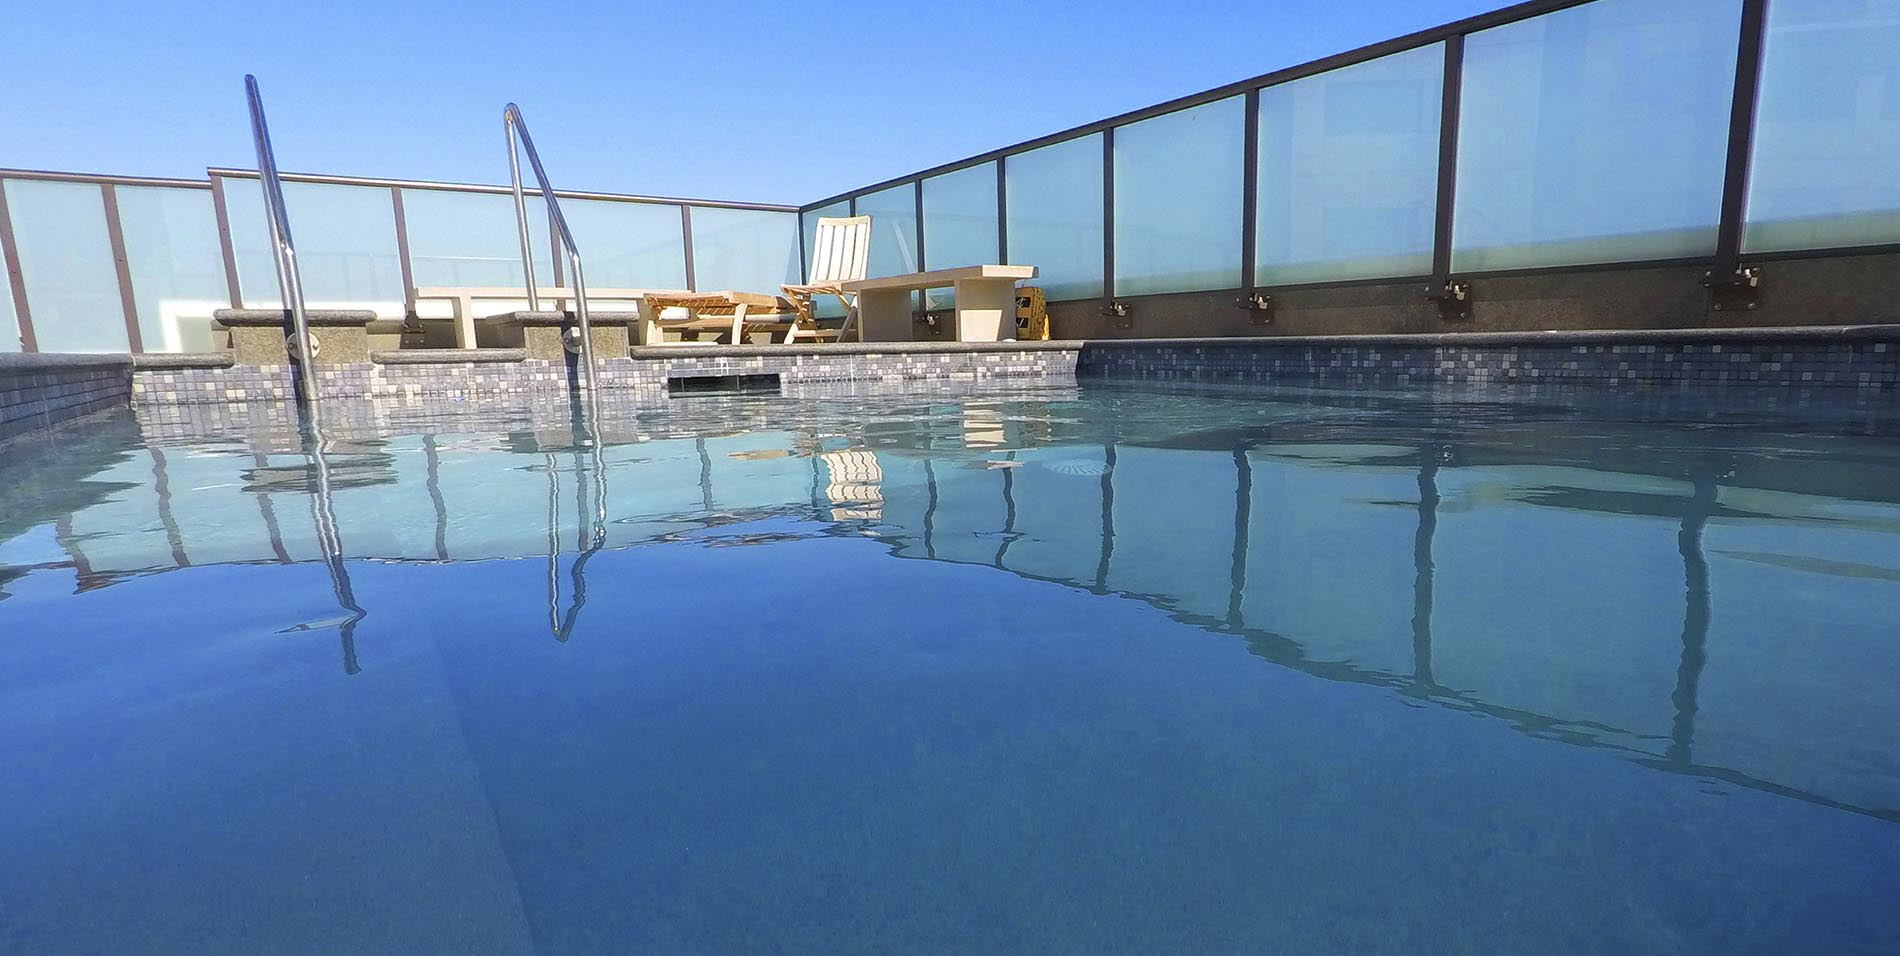 The Spencer Hotel, Takapuna Hotel, Spencer Hotel Spa Pool slideshow HD